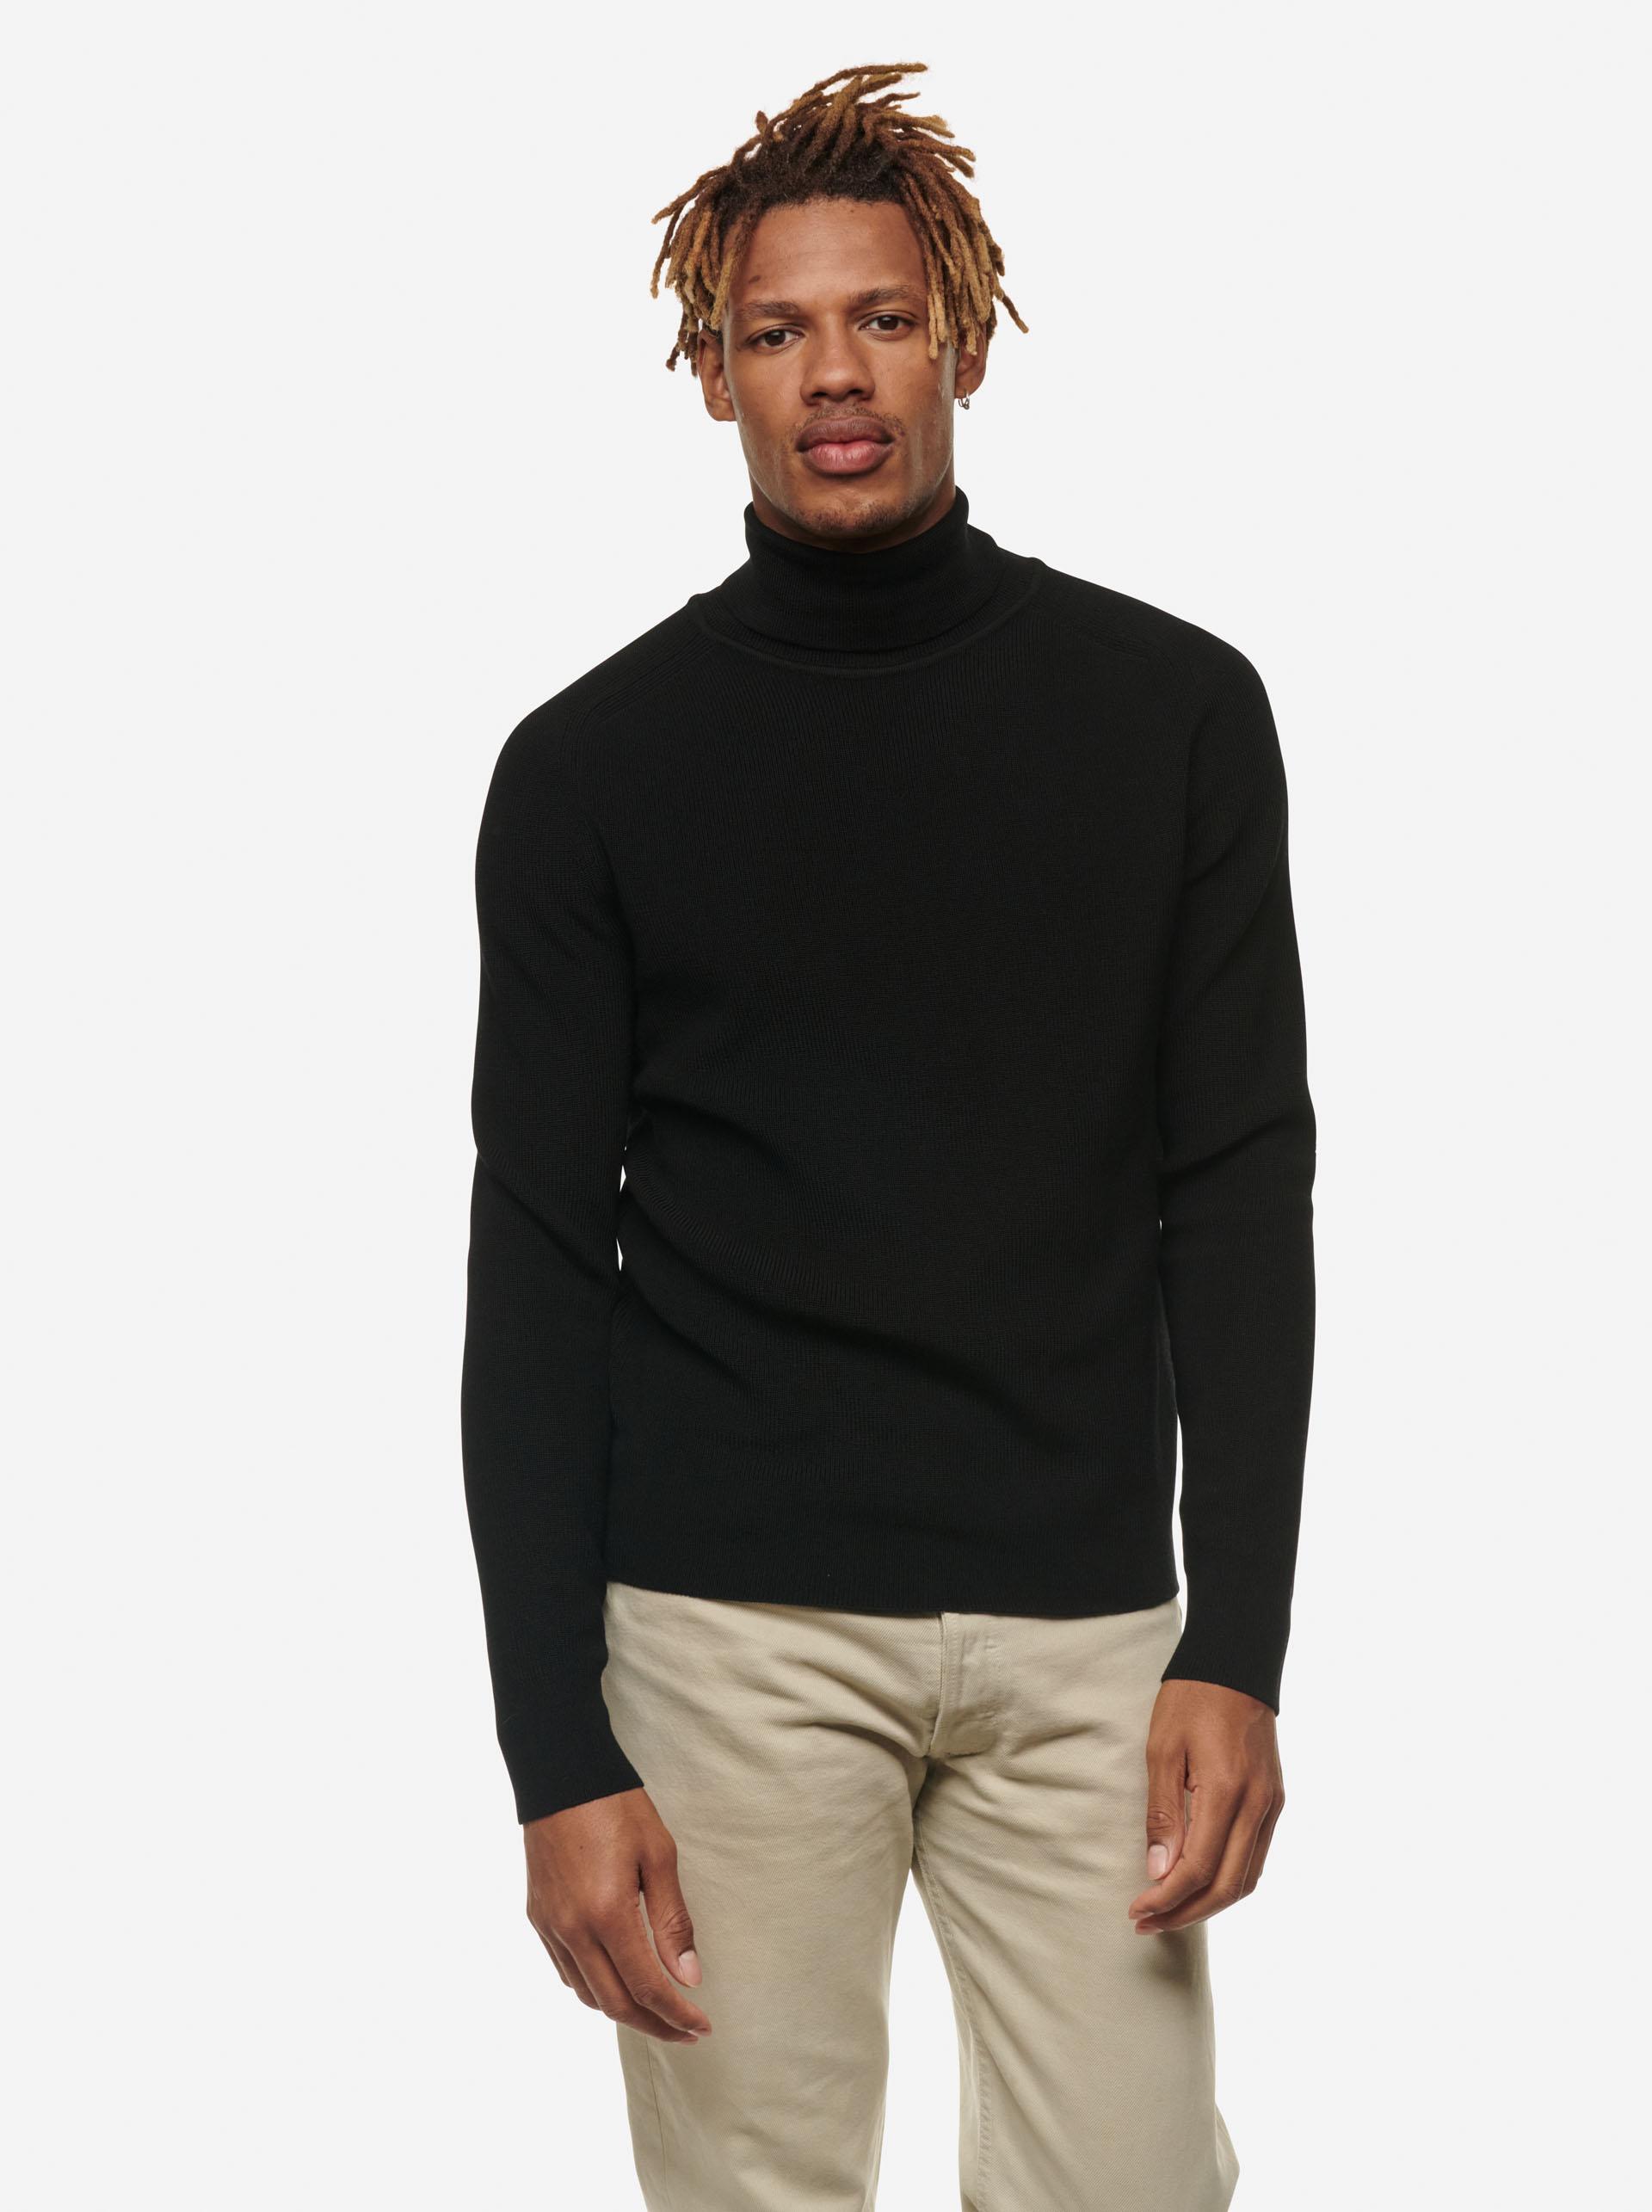 Teym - Turtleneck - The Merino Sweater - Men - Black - 5